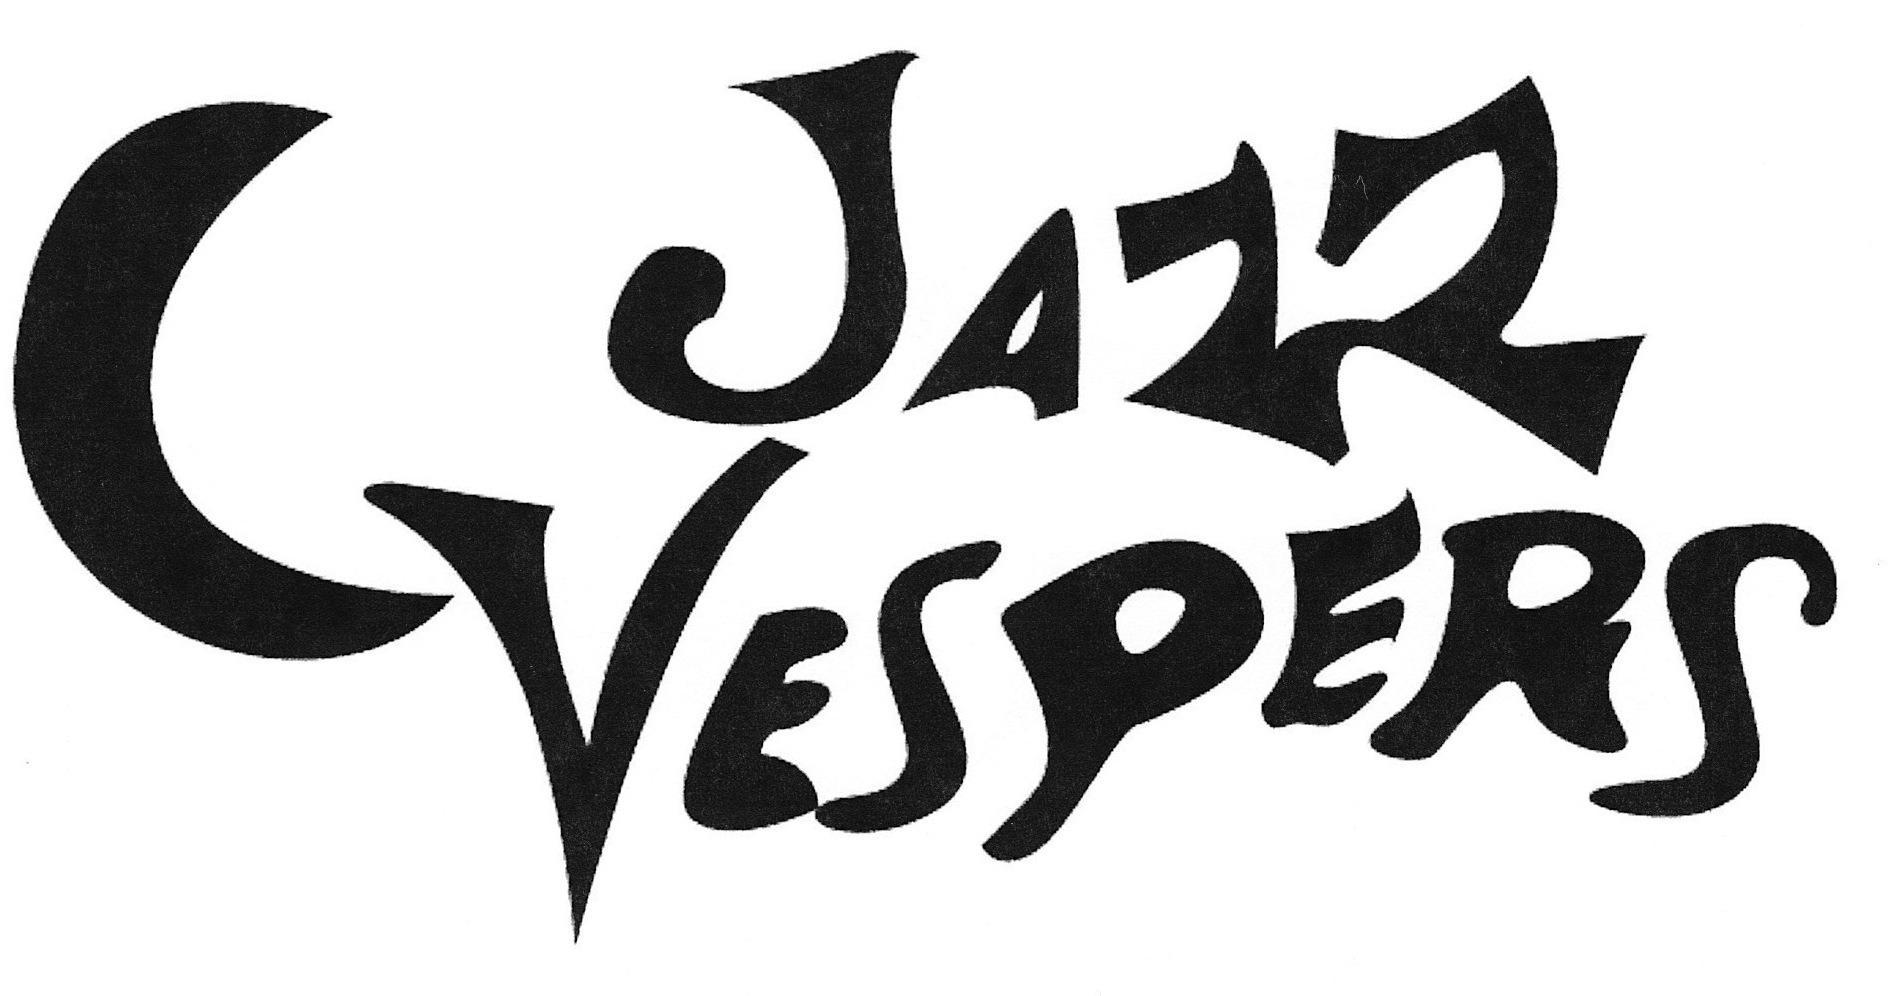 aa70f50fdd3d2bbb7b1b_Jazz_Vespers_Logo.jpg